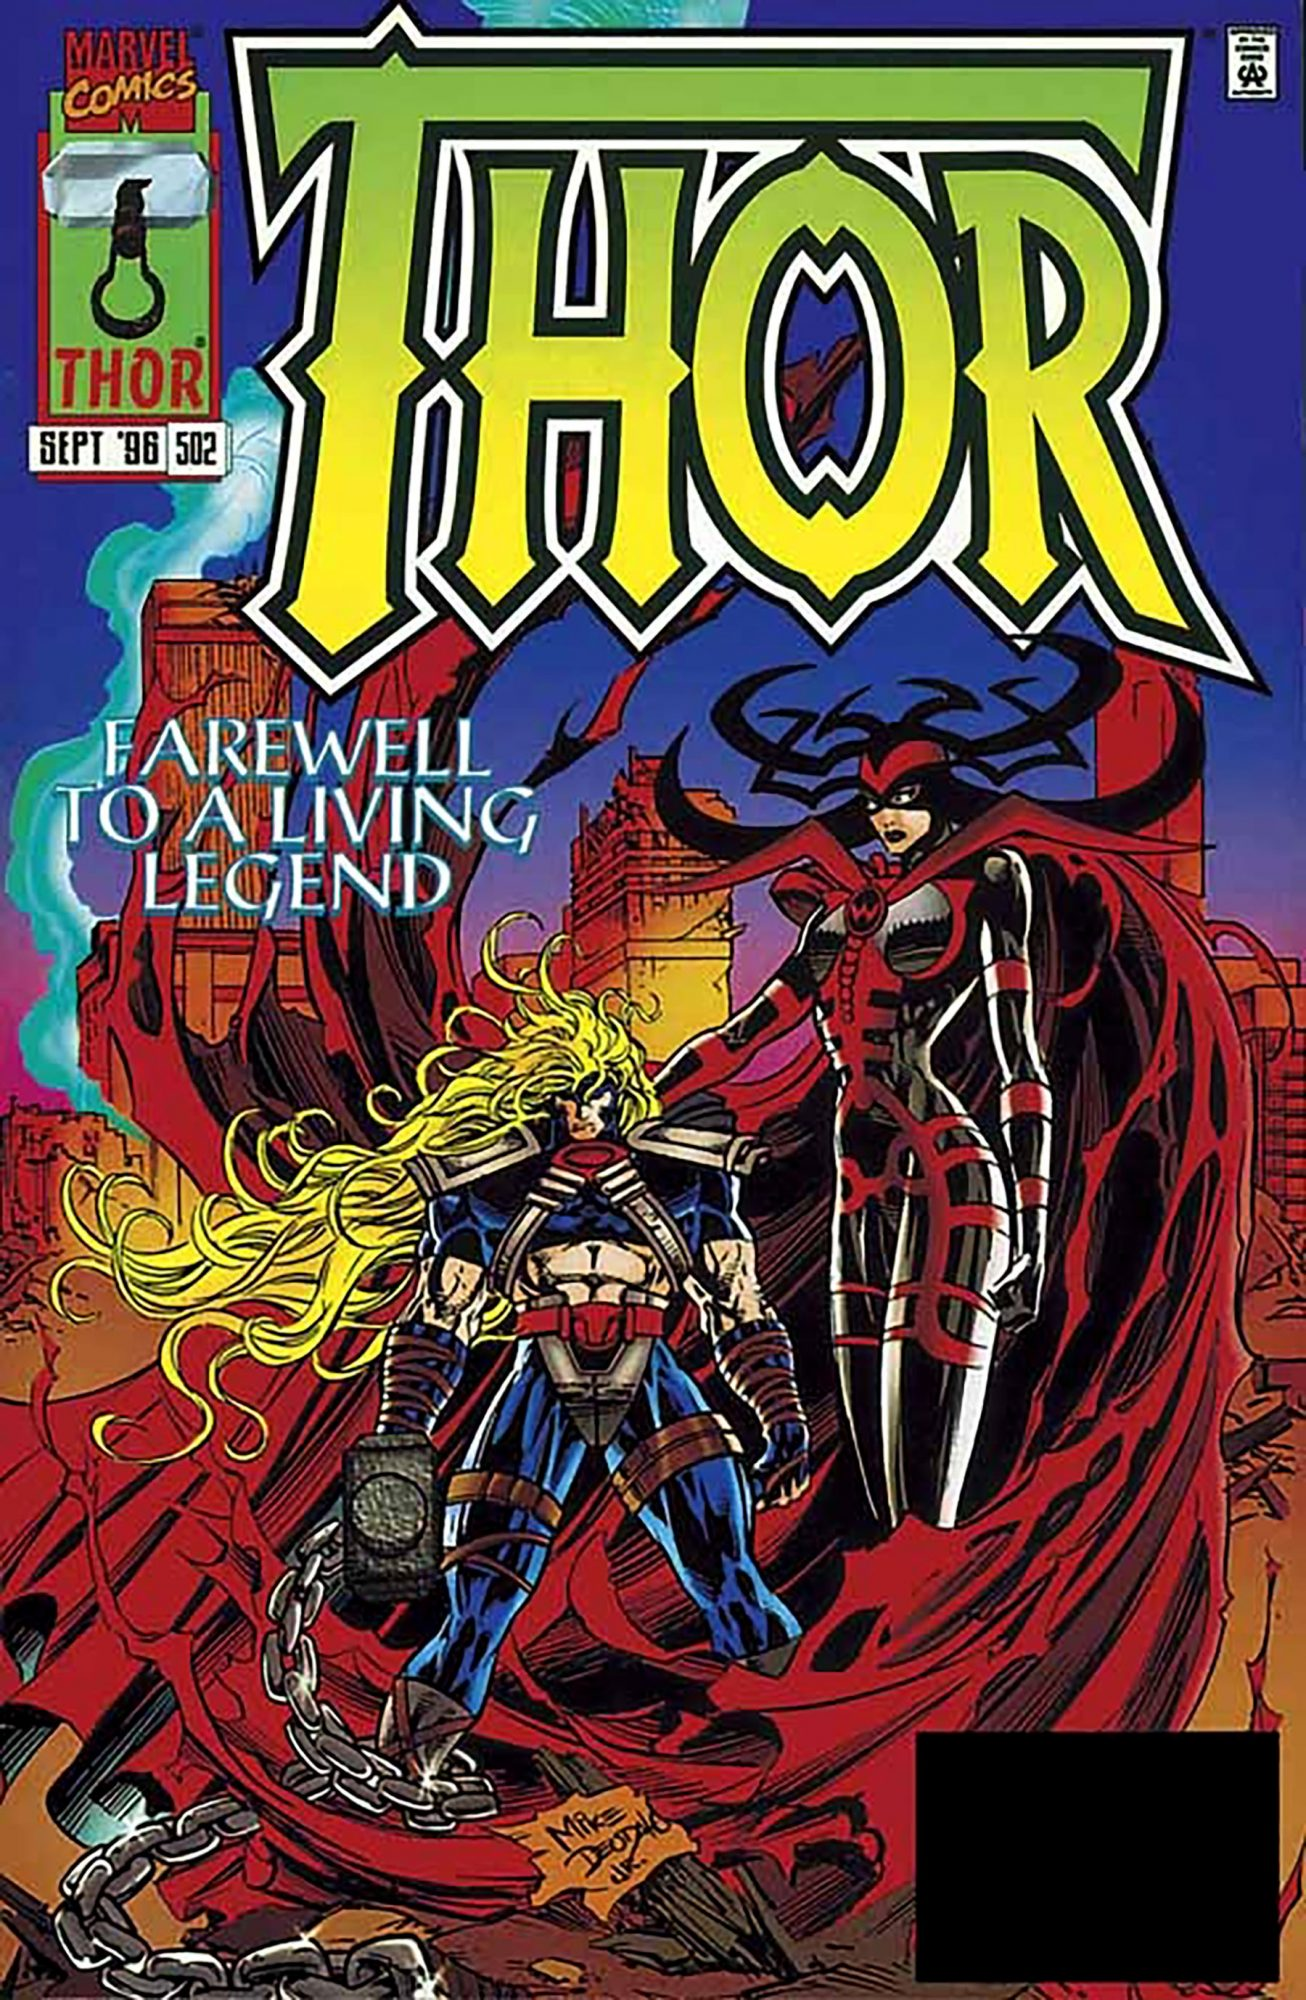 Glam Thor